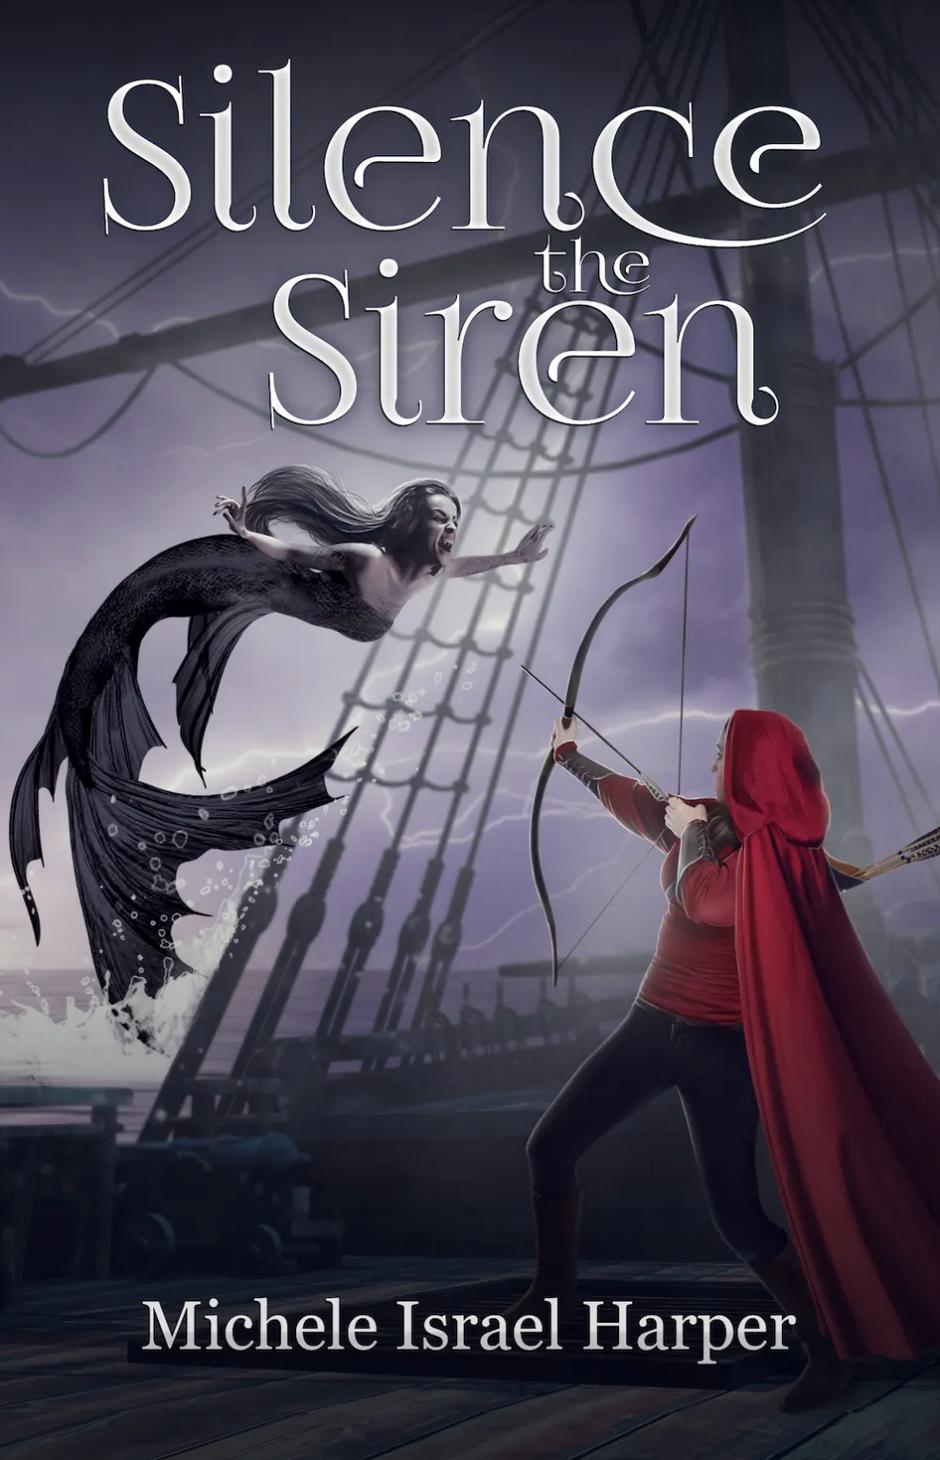 silence the siren cover